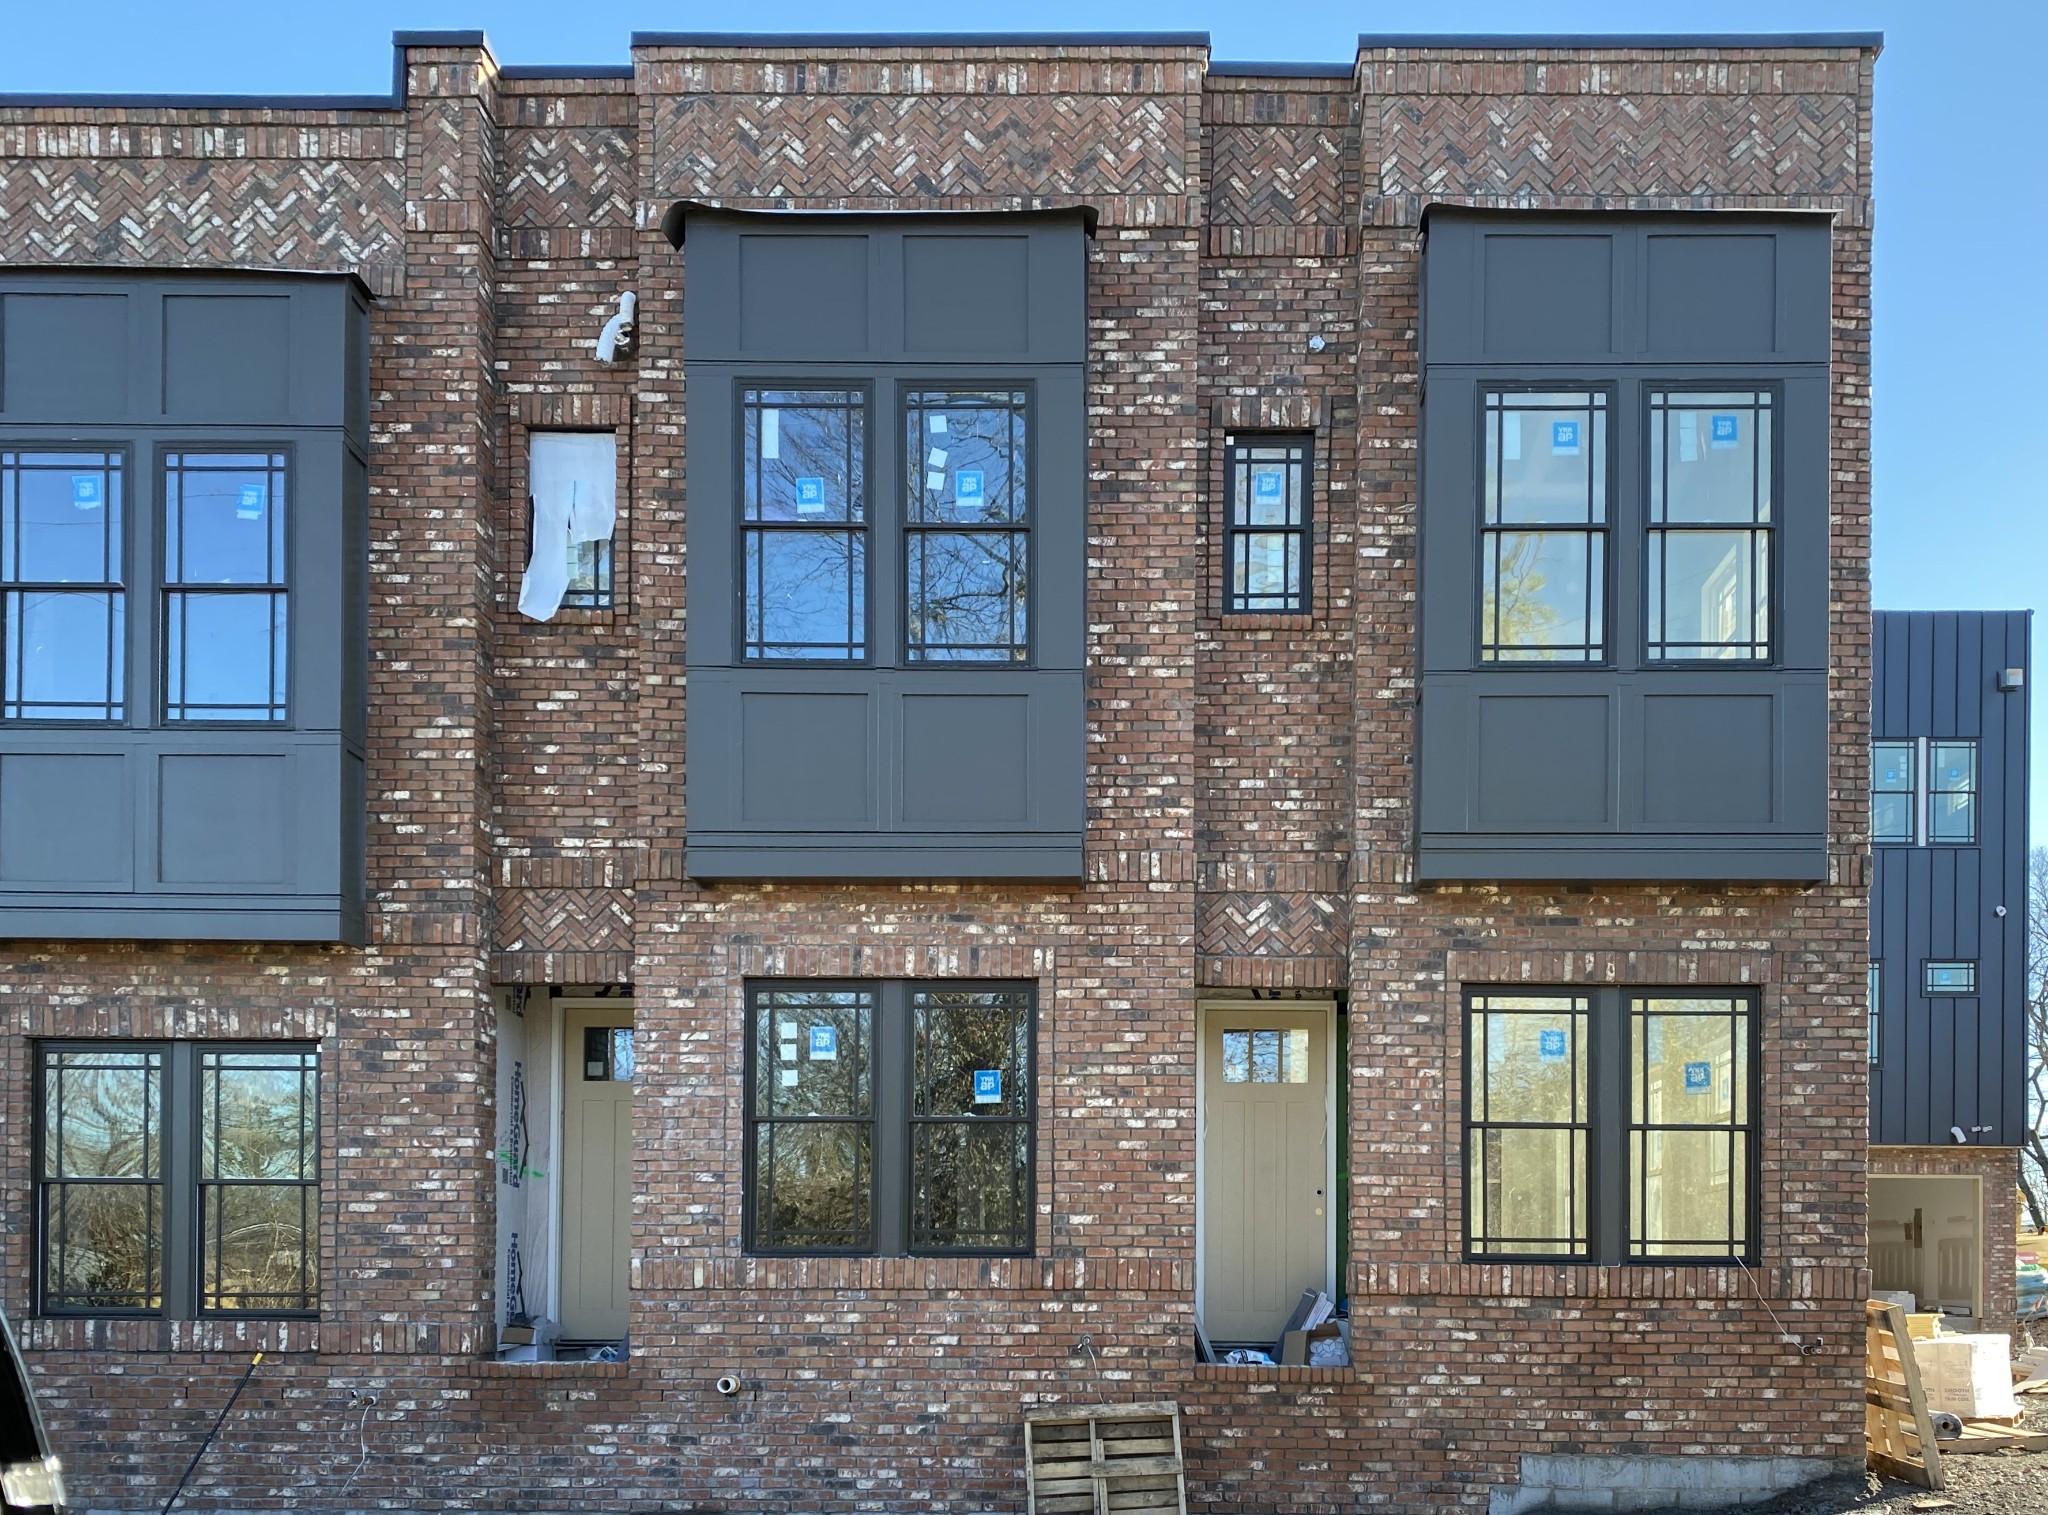 7072 26th Ave N, Nashville, TN 37209 - Nashville, TN real estate listing